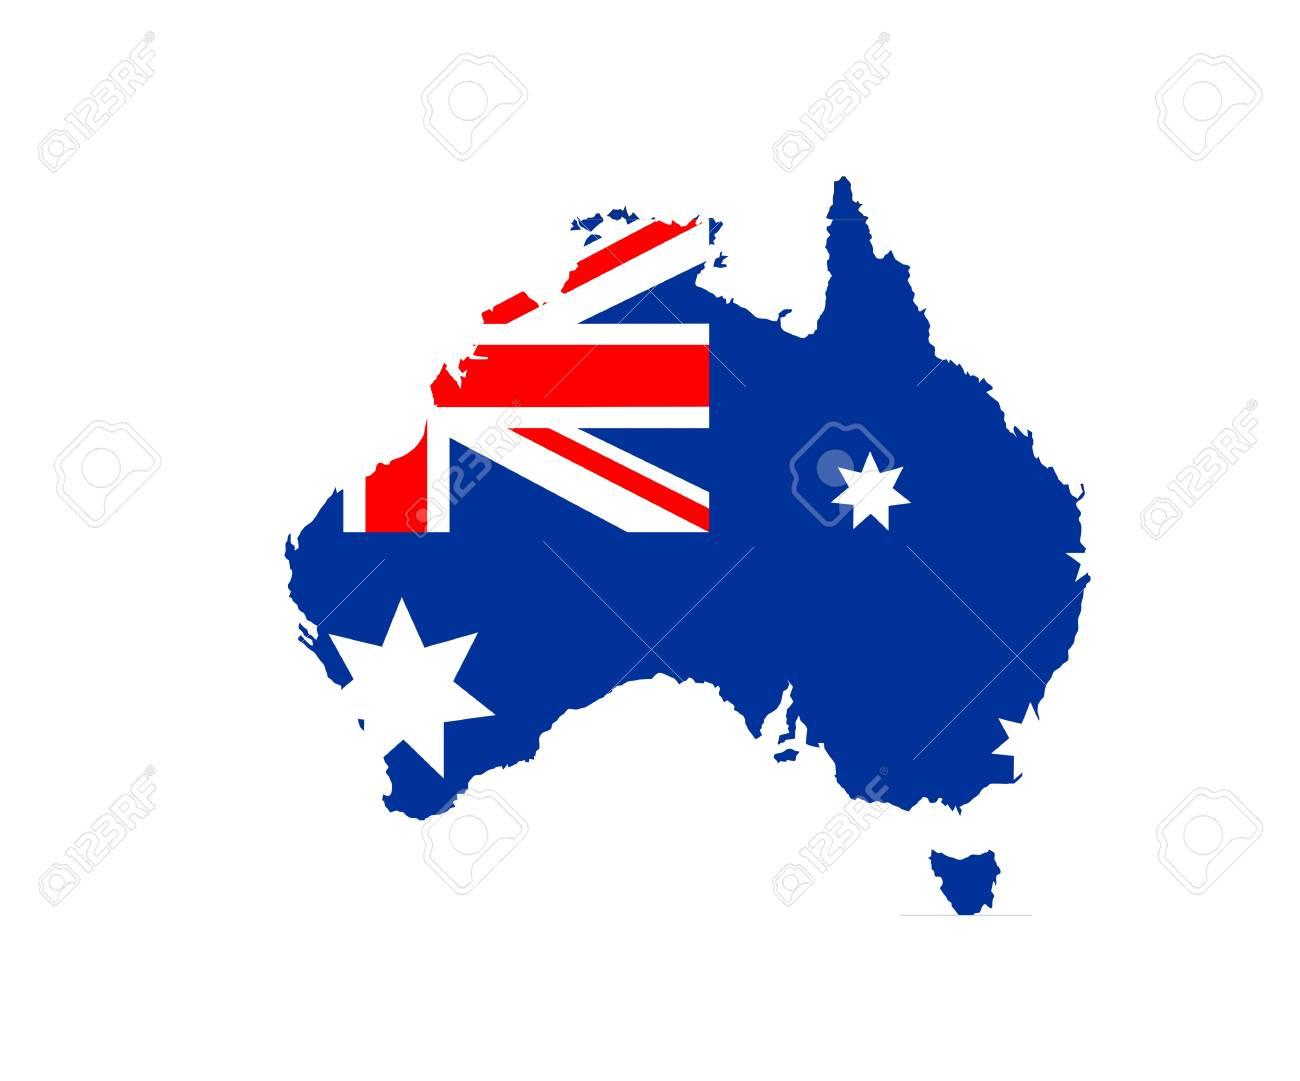 Australia Map Shape.Australia Country National Flag Map Shape Illustration Stock Photo